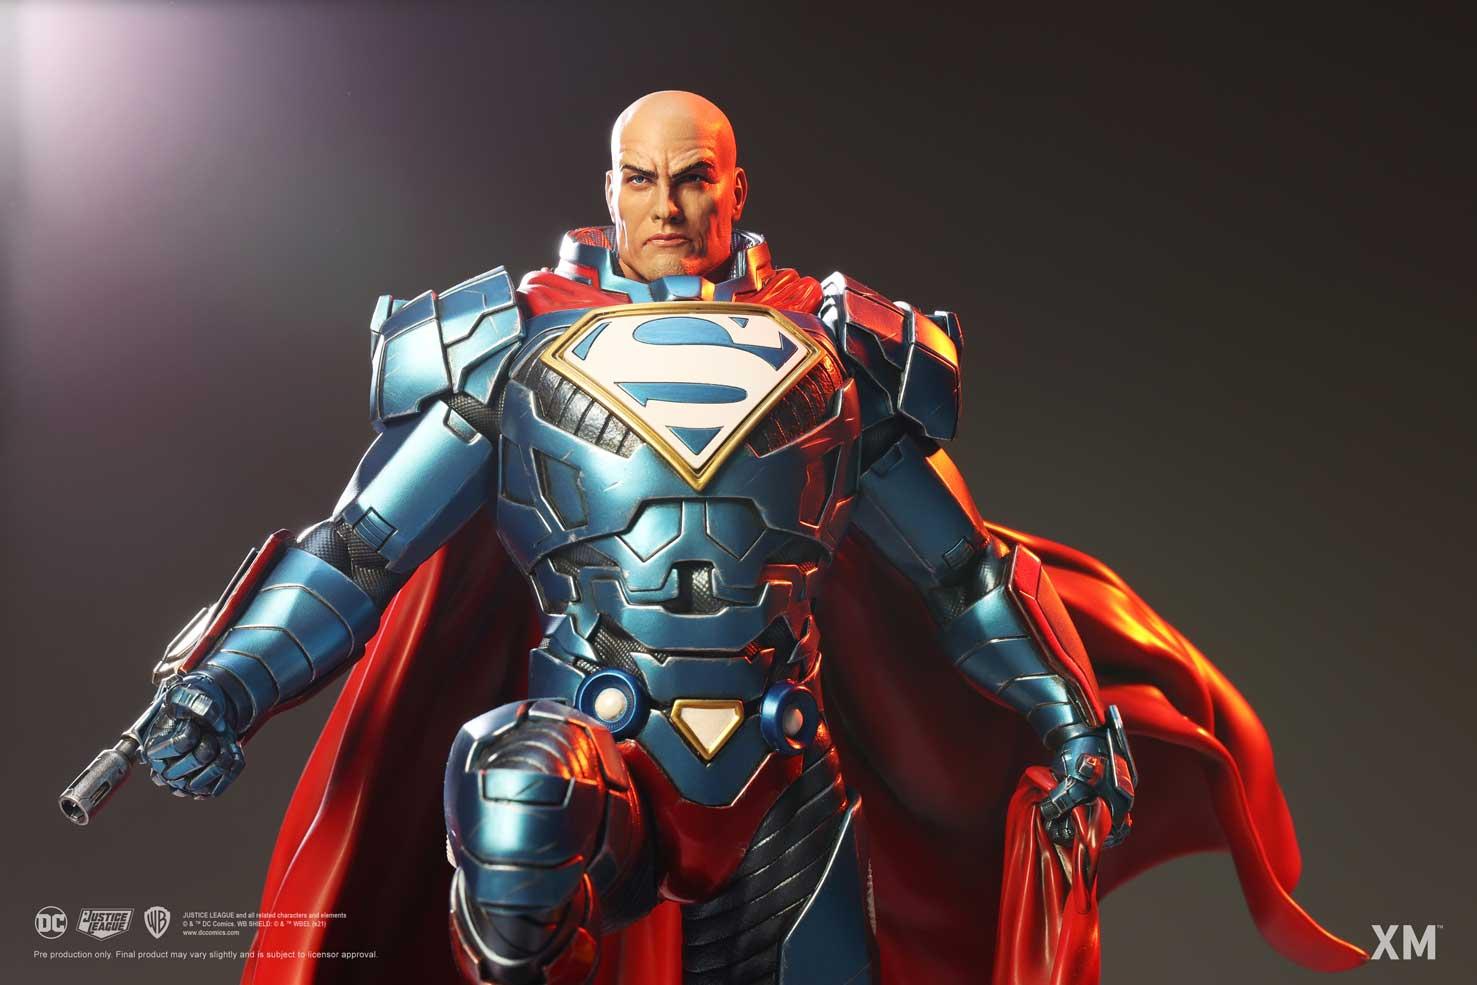 Link a Xm Studios_Lex_Luthor_Superman_DC- (1)